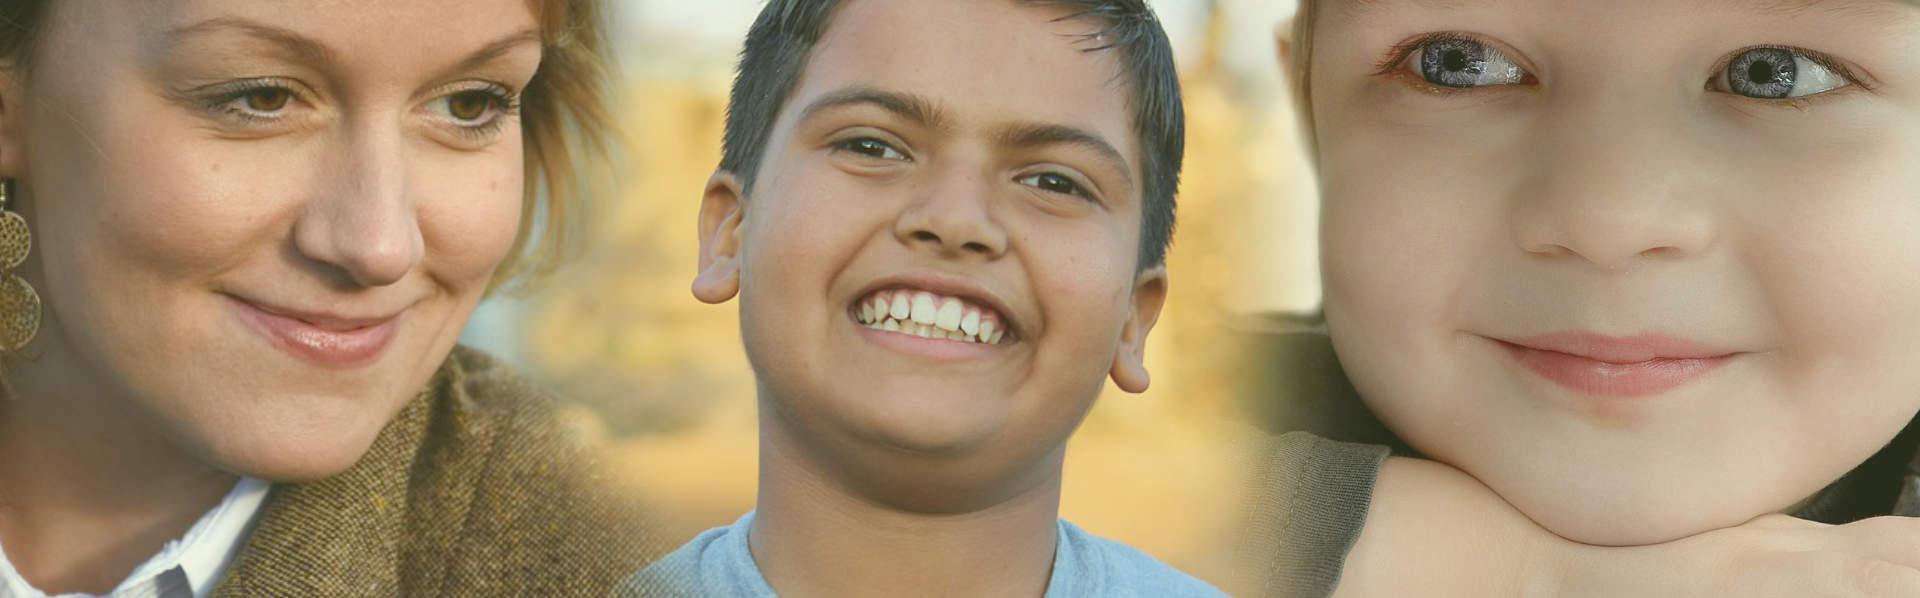 Gesichtsmerkmale physiognomie agnosiaprosopon